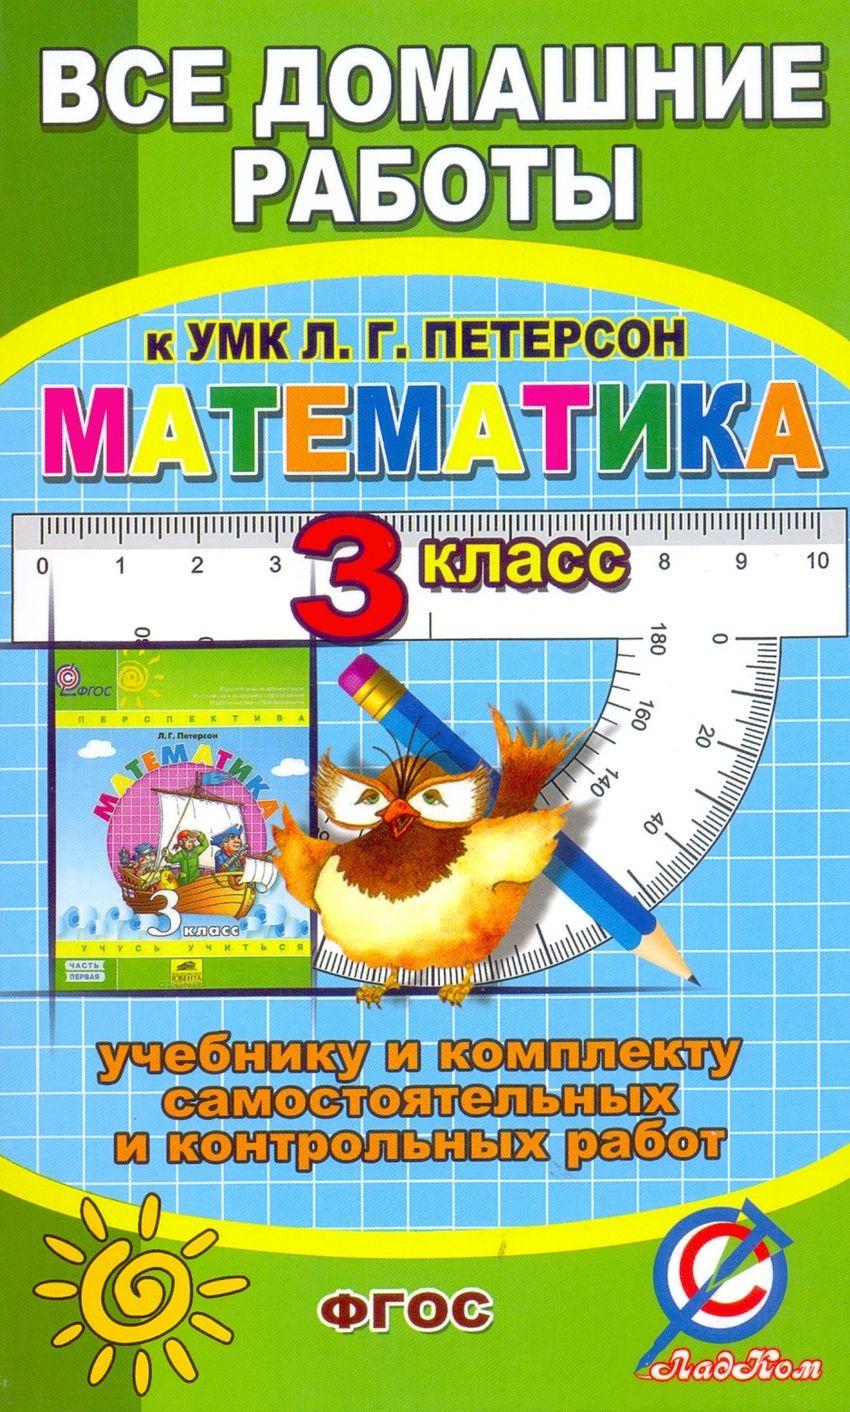 Гдз по русскому 10-11 класс сабаткоев